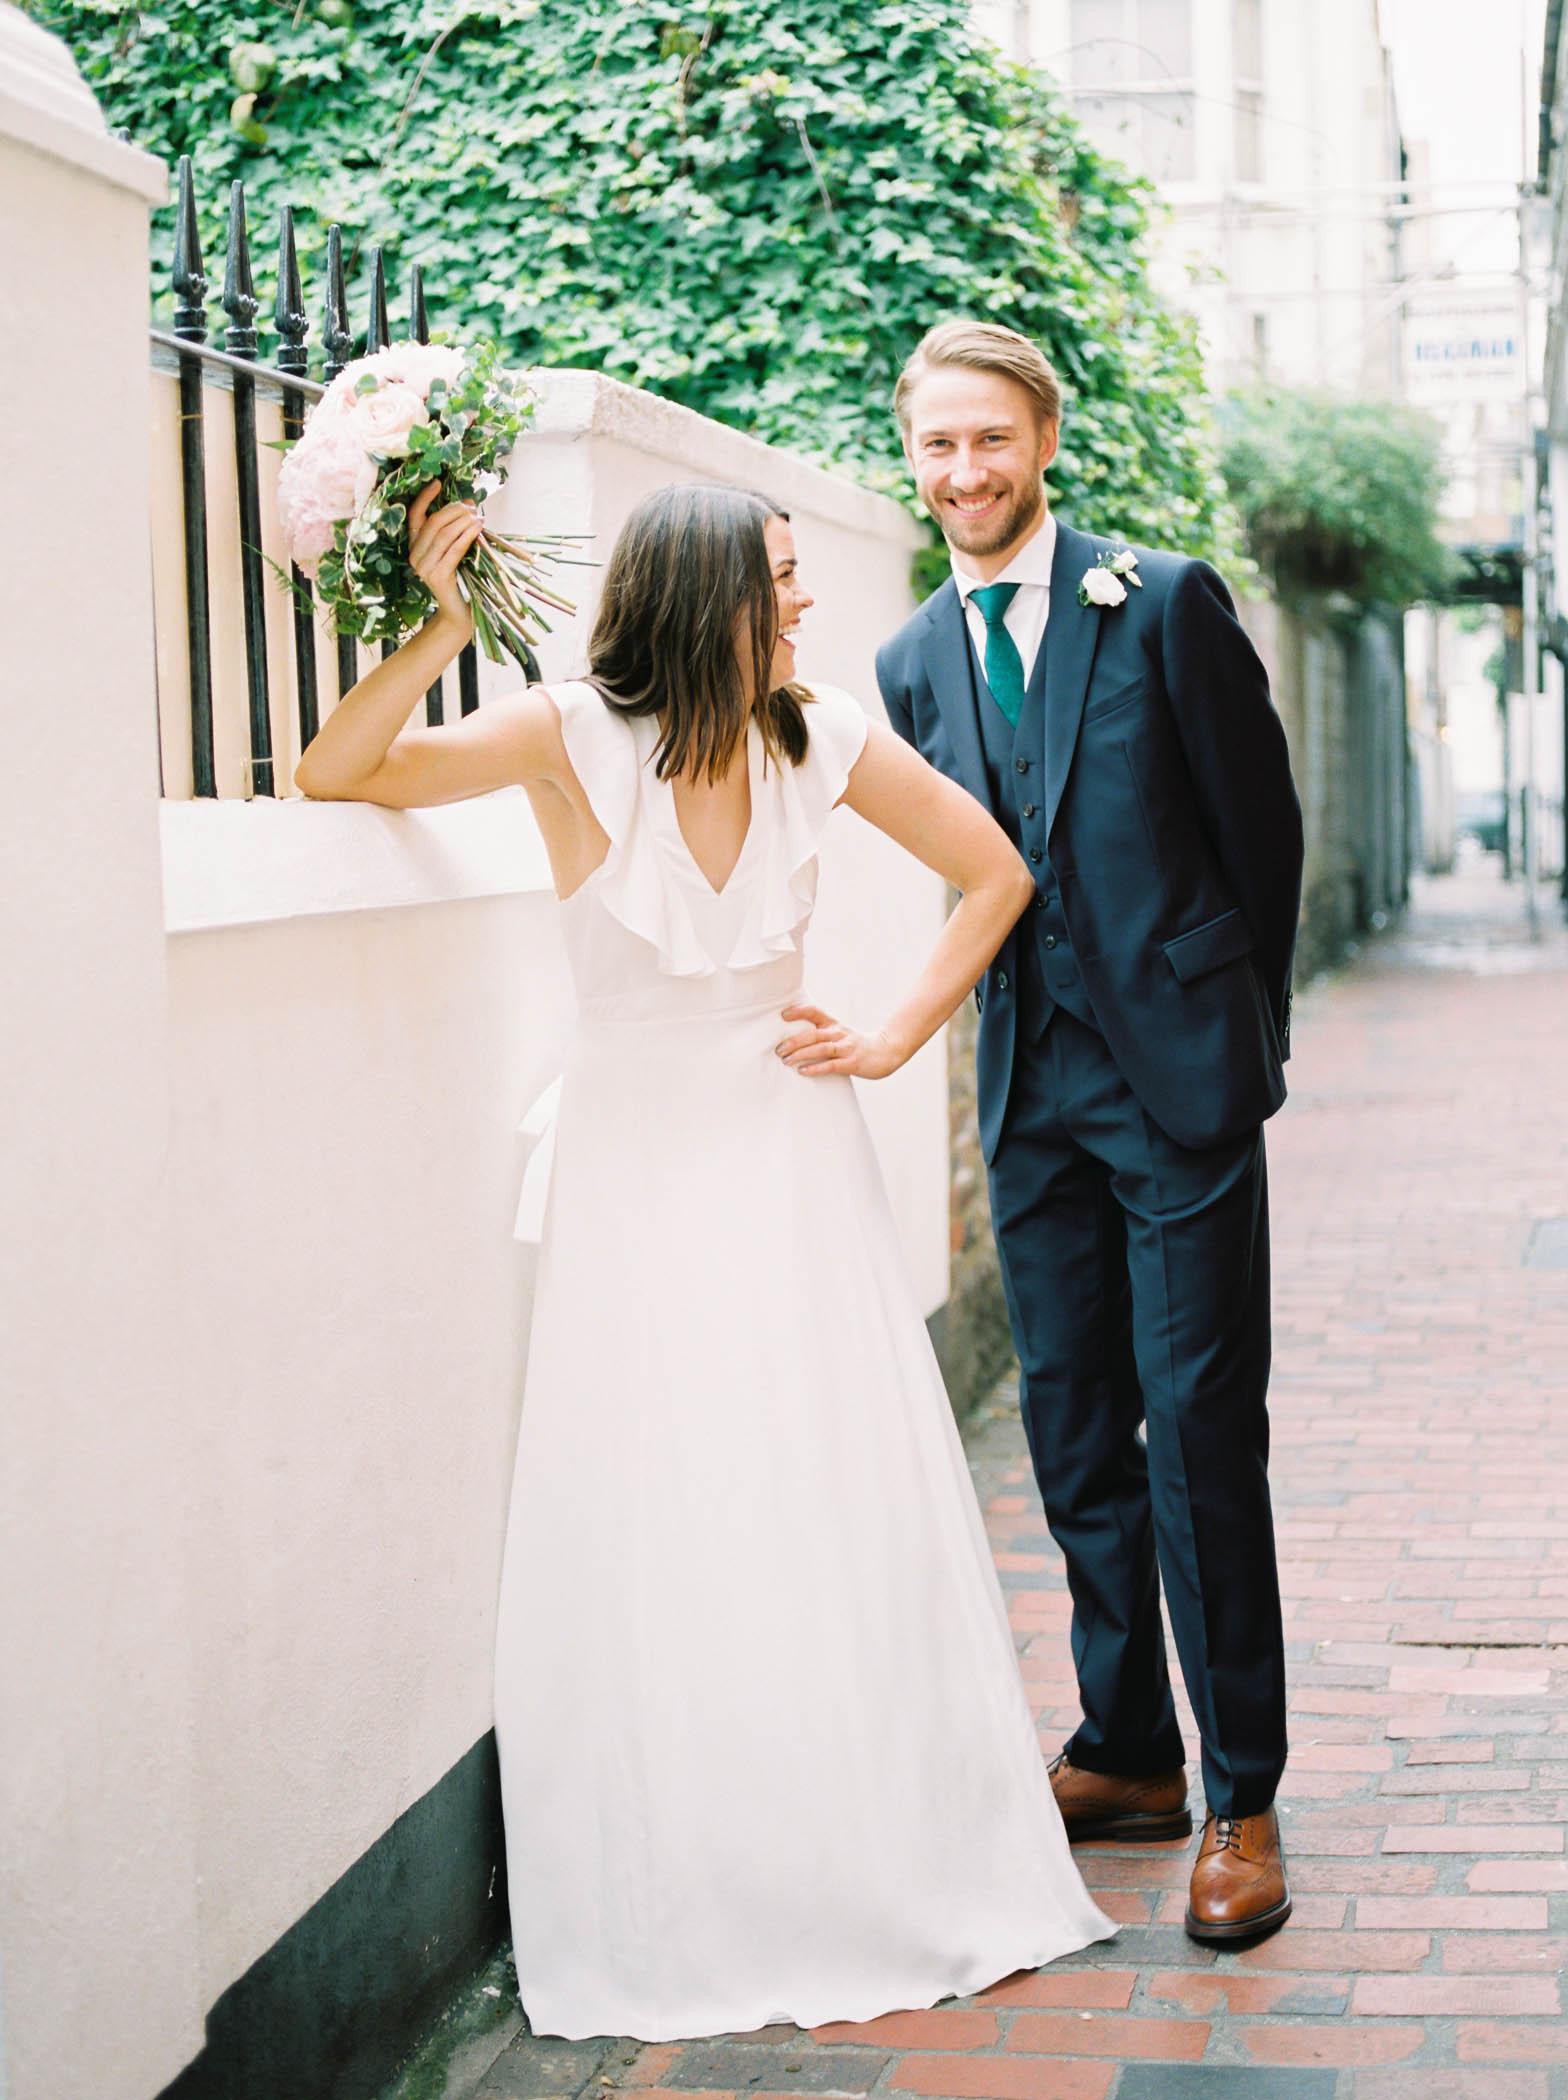 The Anna Edit Wedding- Brighton Town Hall Wedding